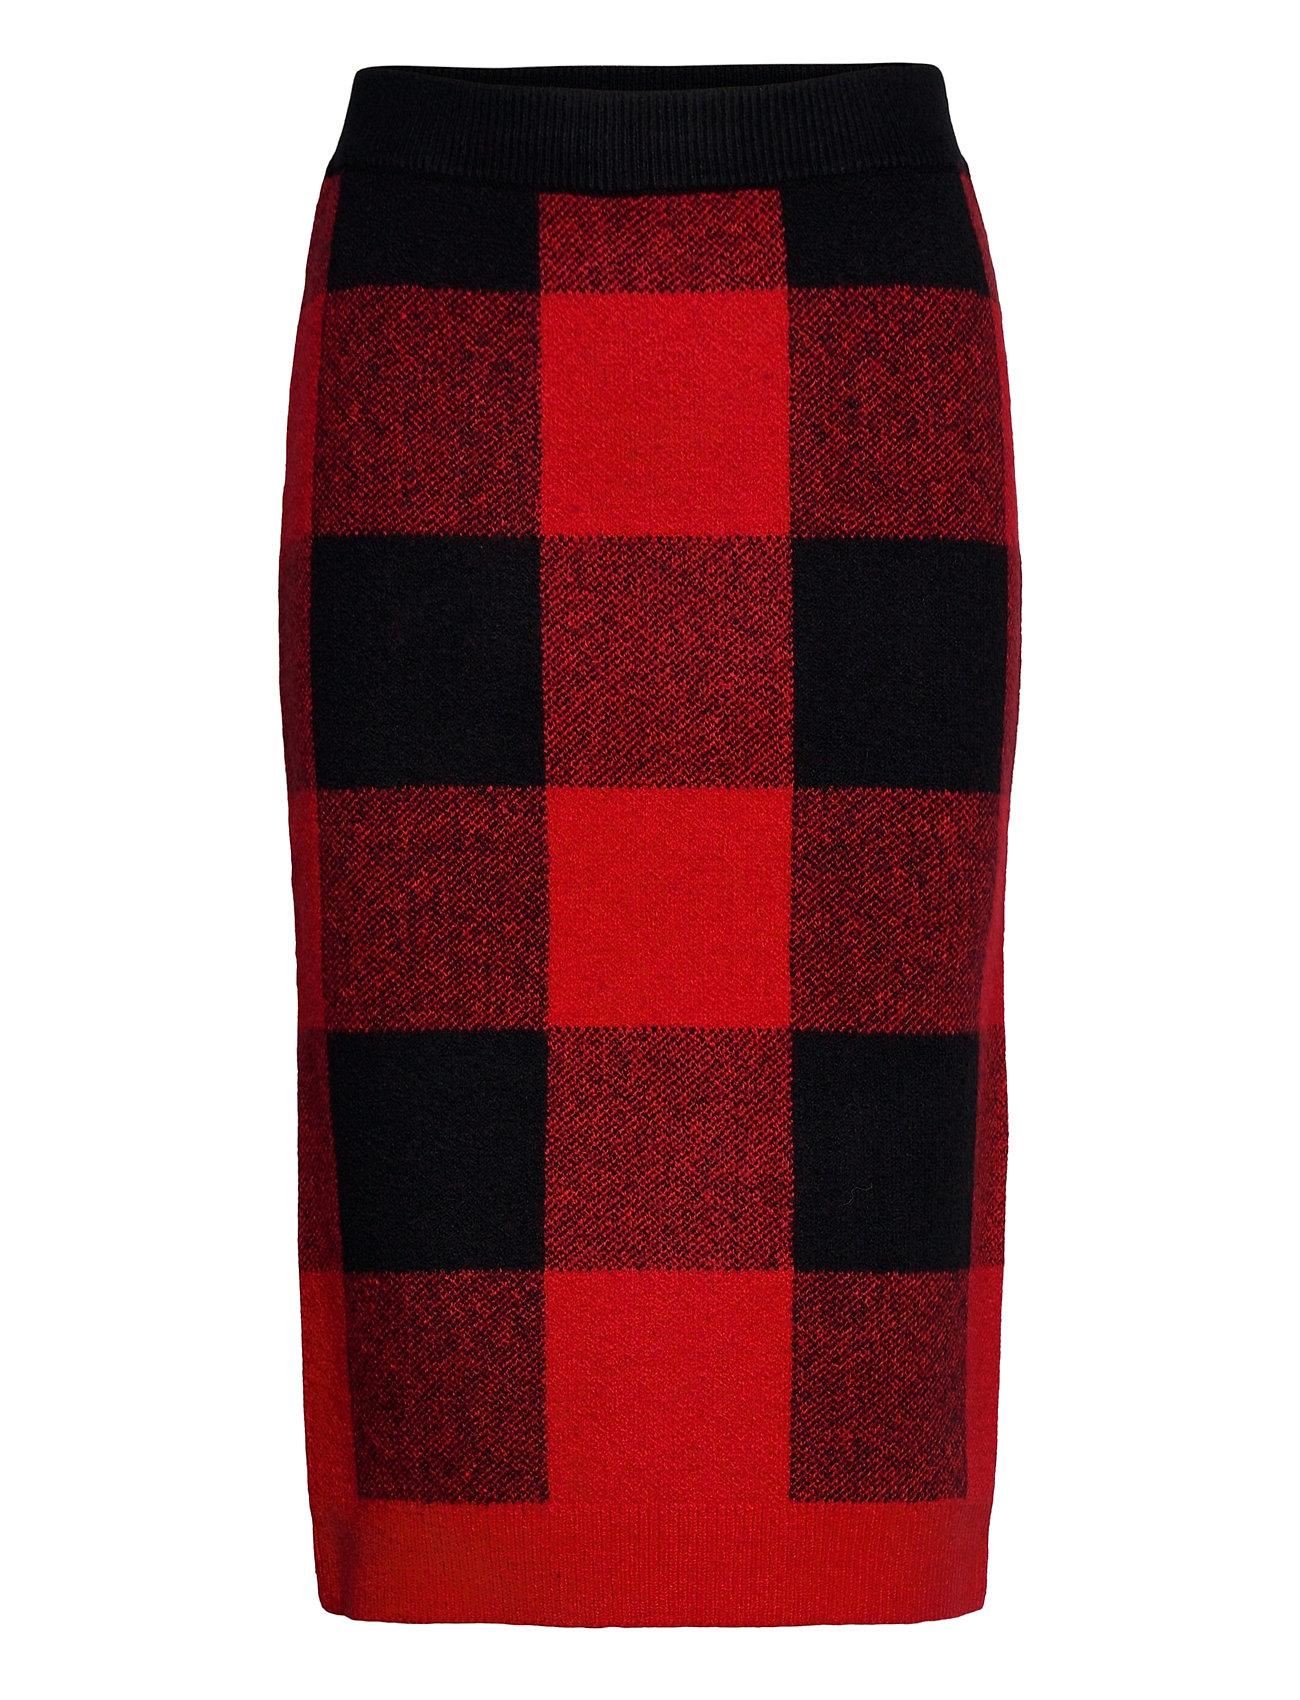 Image of Skirts Knitted Knælang Nederdel Rød EDC By Esprit (3456630295)